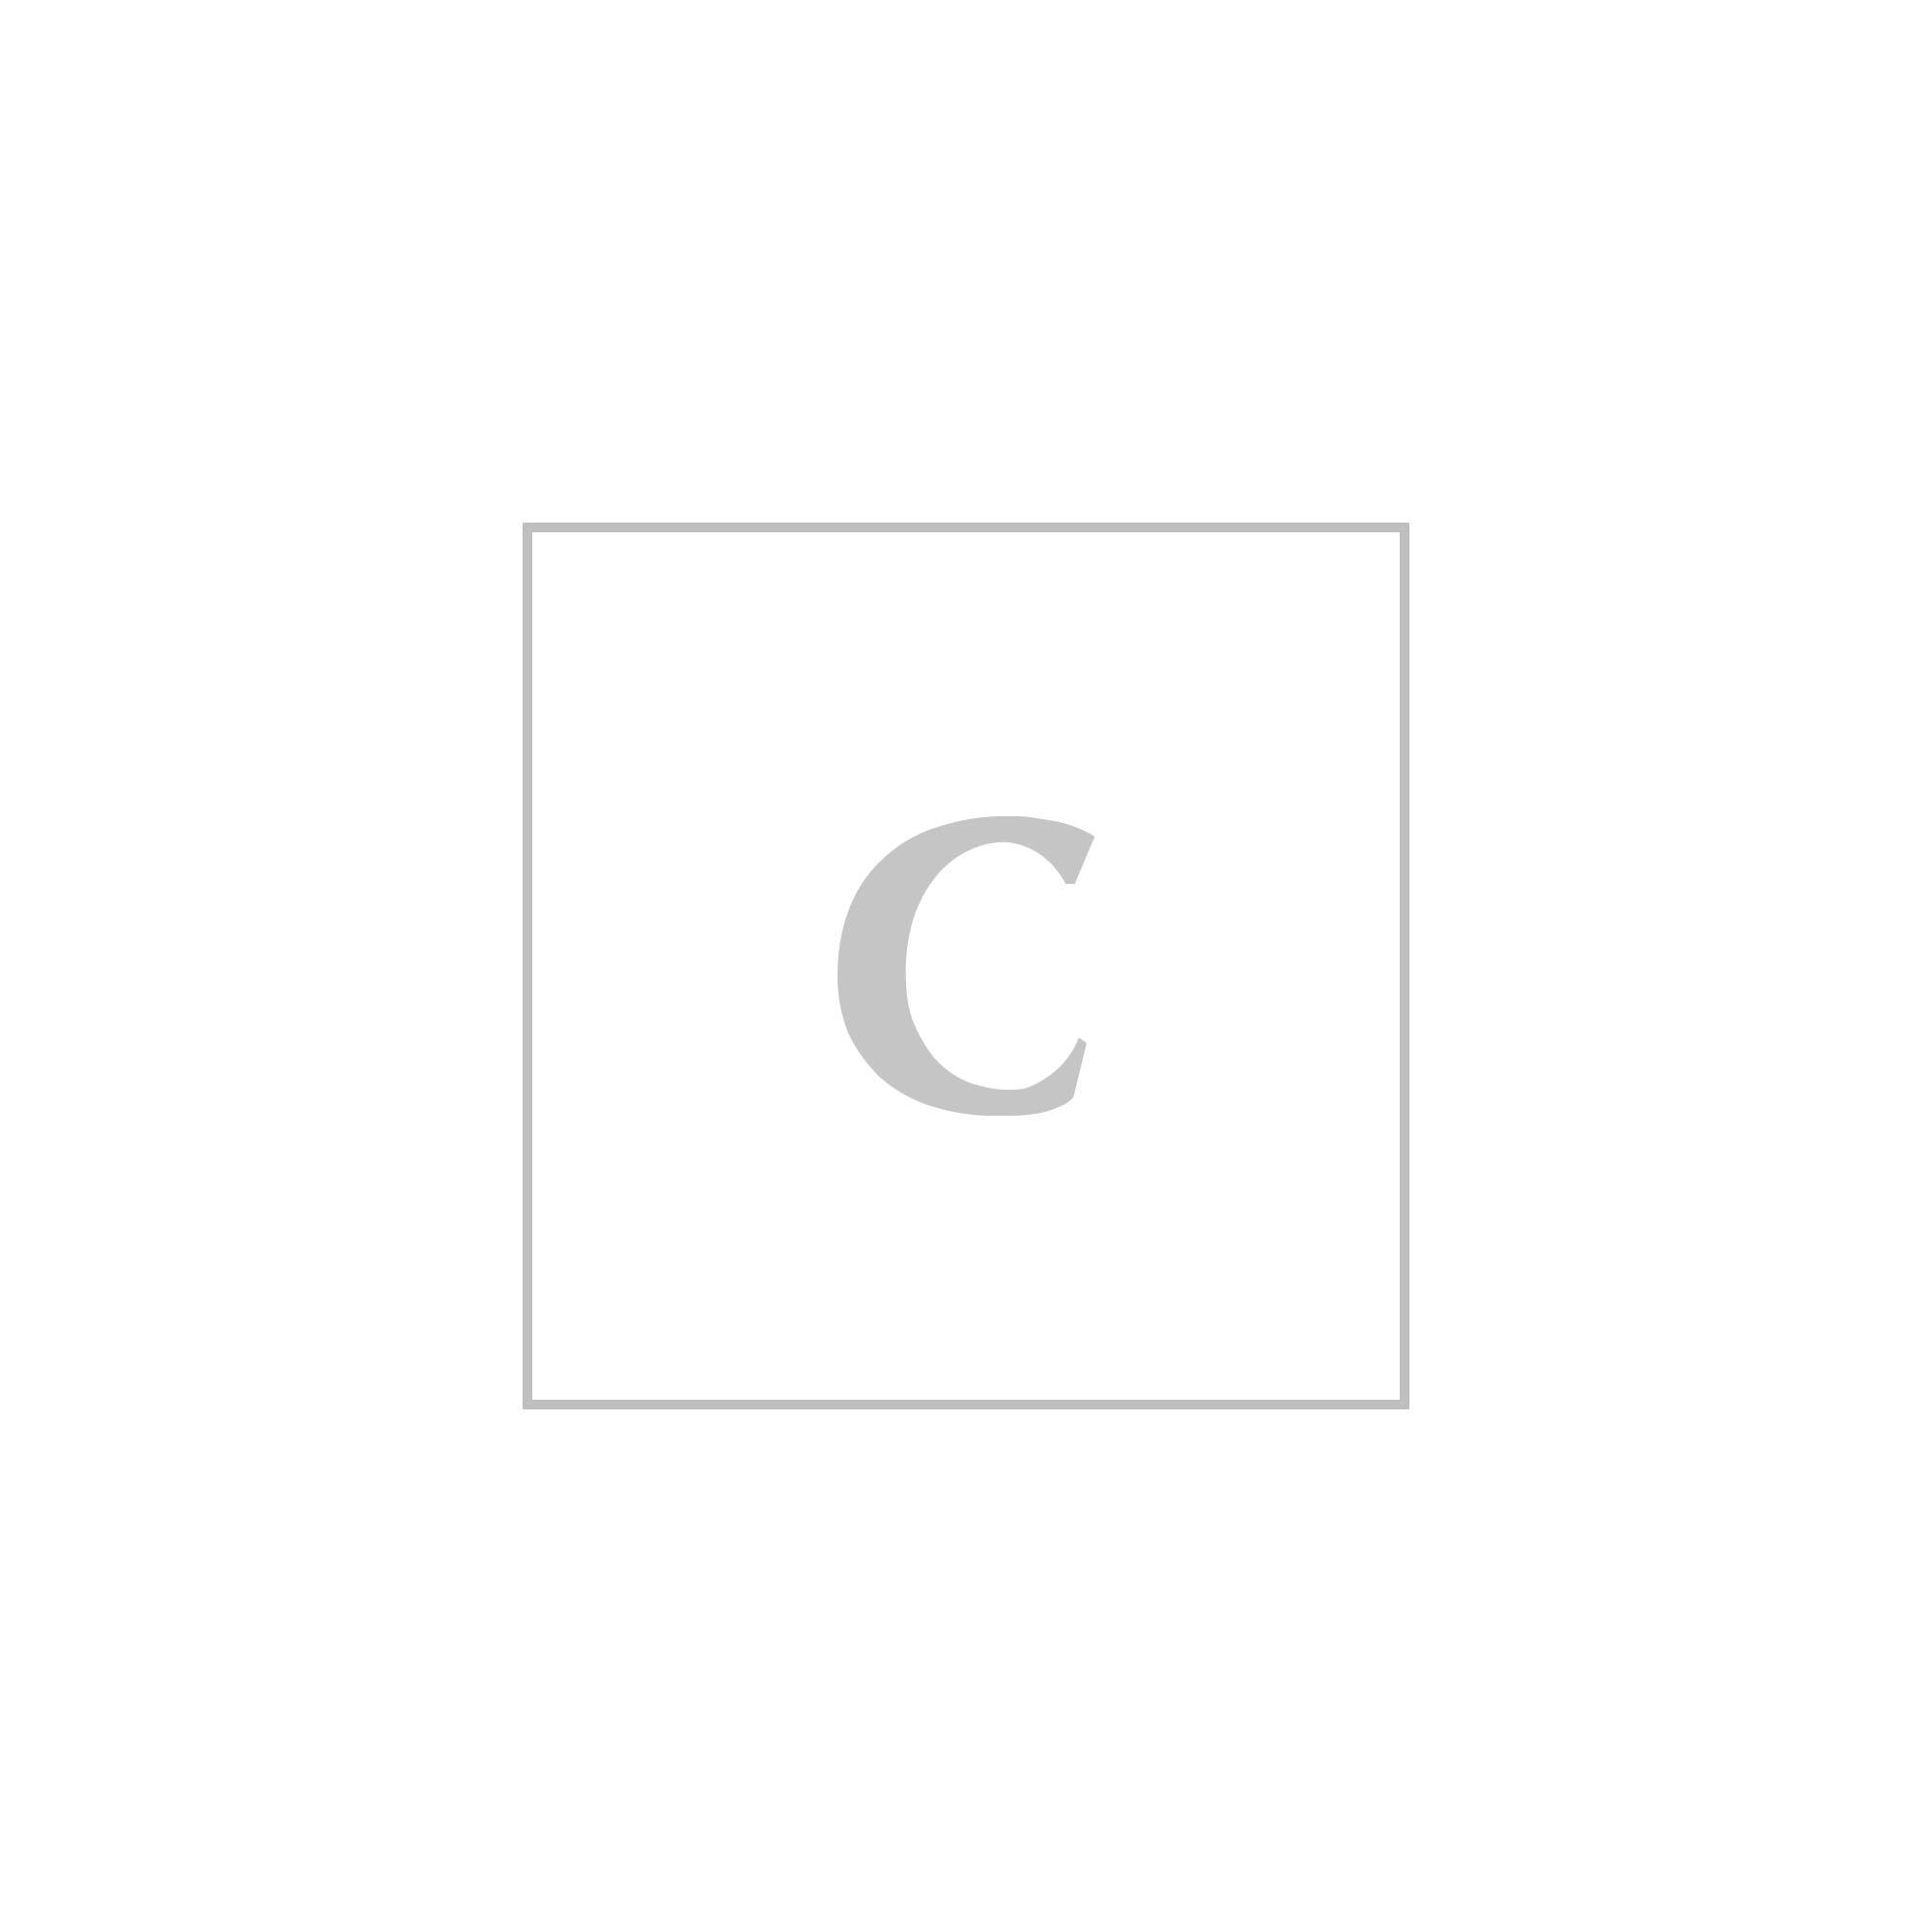 Saint laurent ysl mini pochette monogram grain de poudre